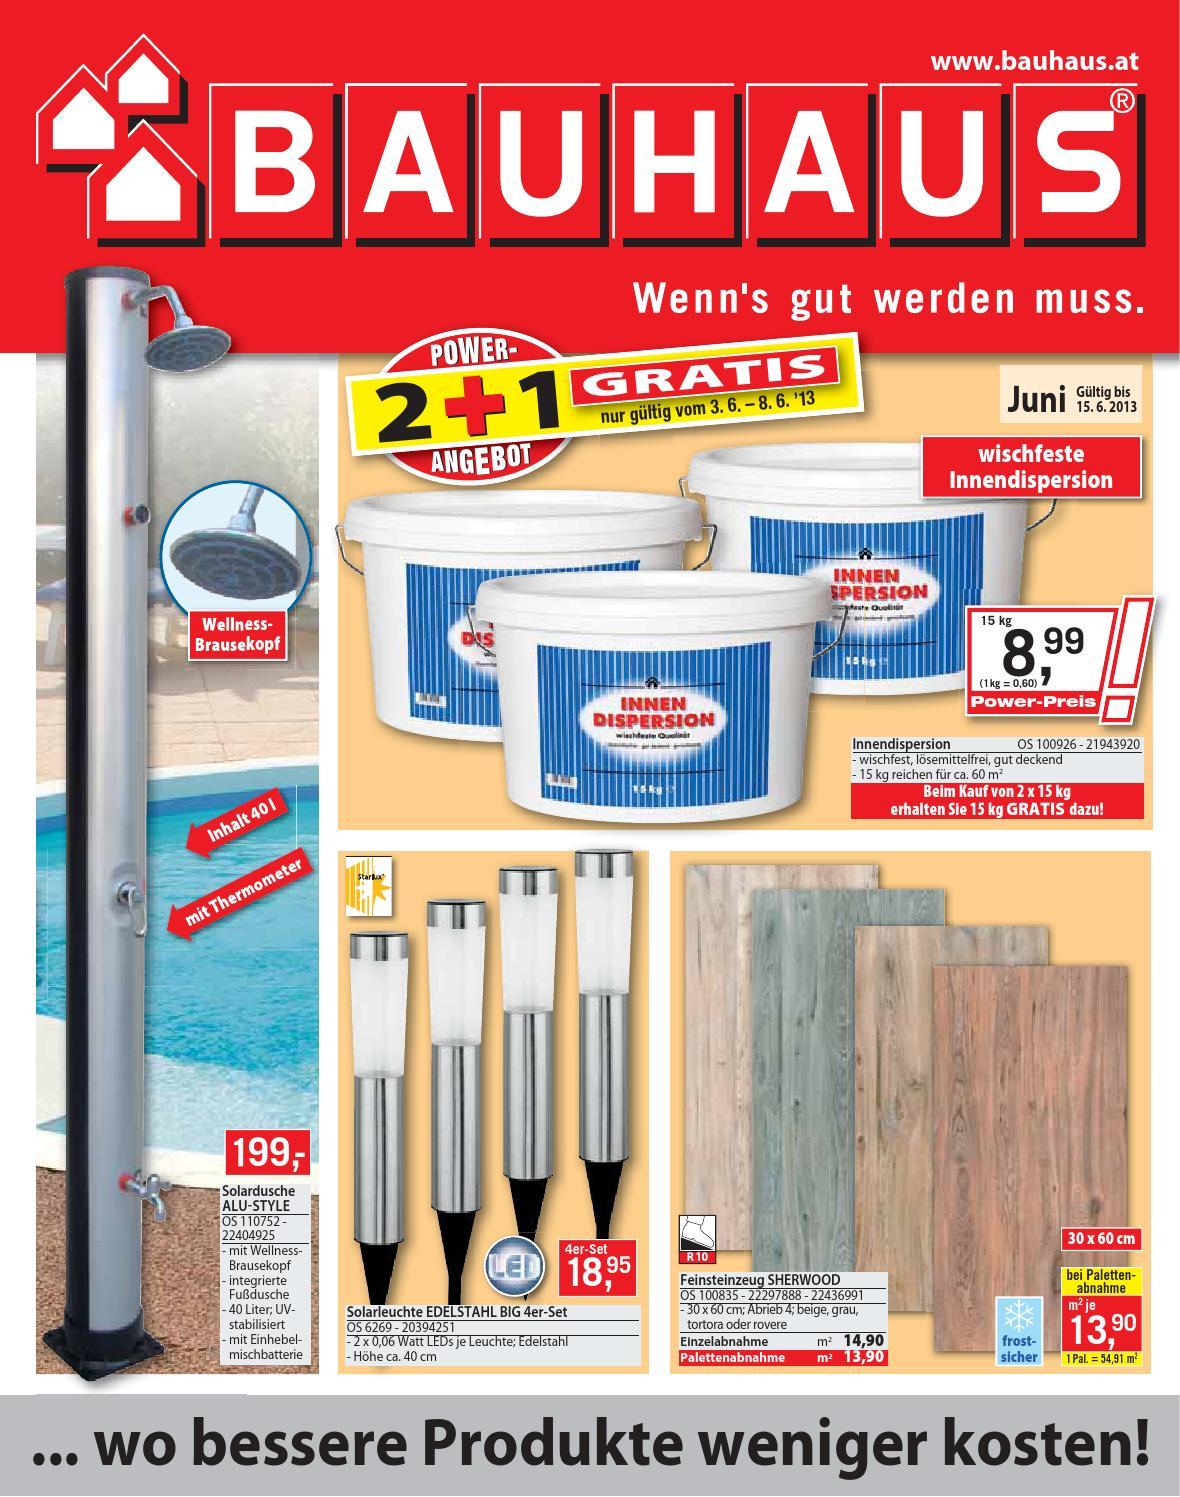 bauhaus 03 06 15 06 by aktionsfinder gmbh issuu. Black Bedroom Furniture Sets. Home Design Ideas